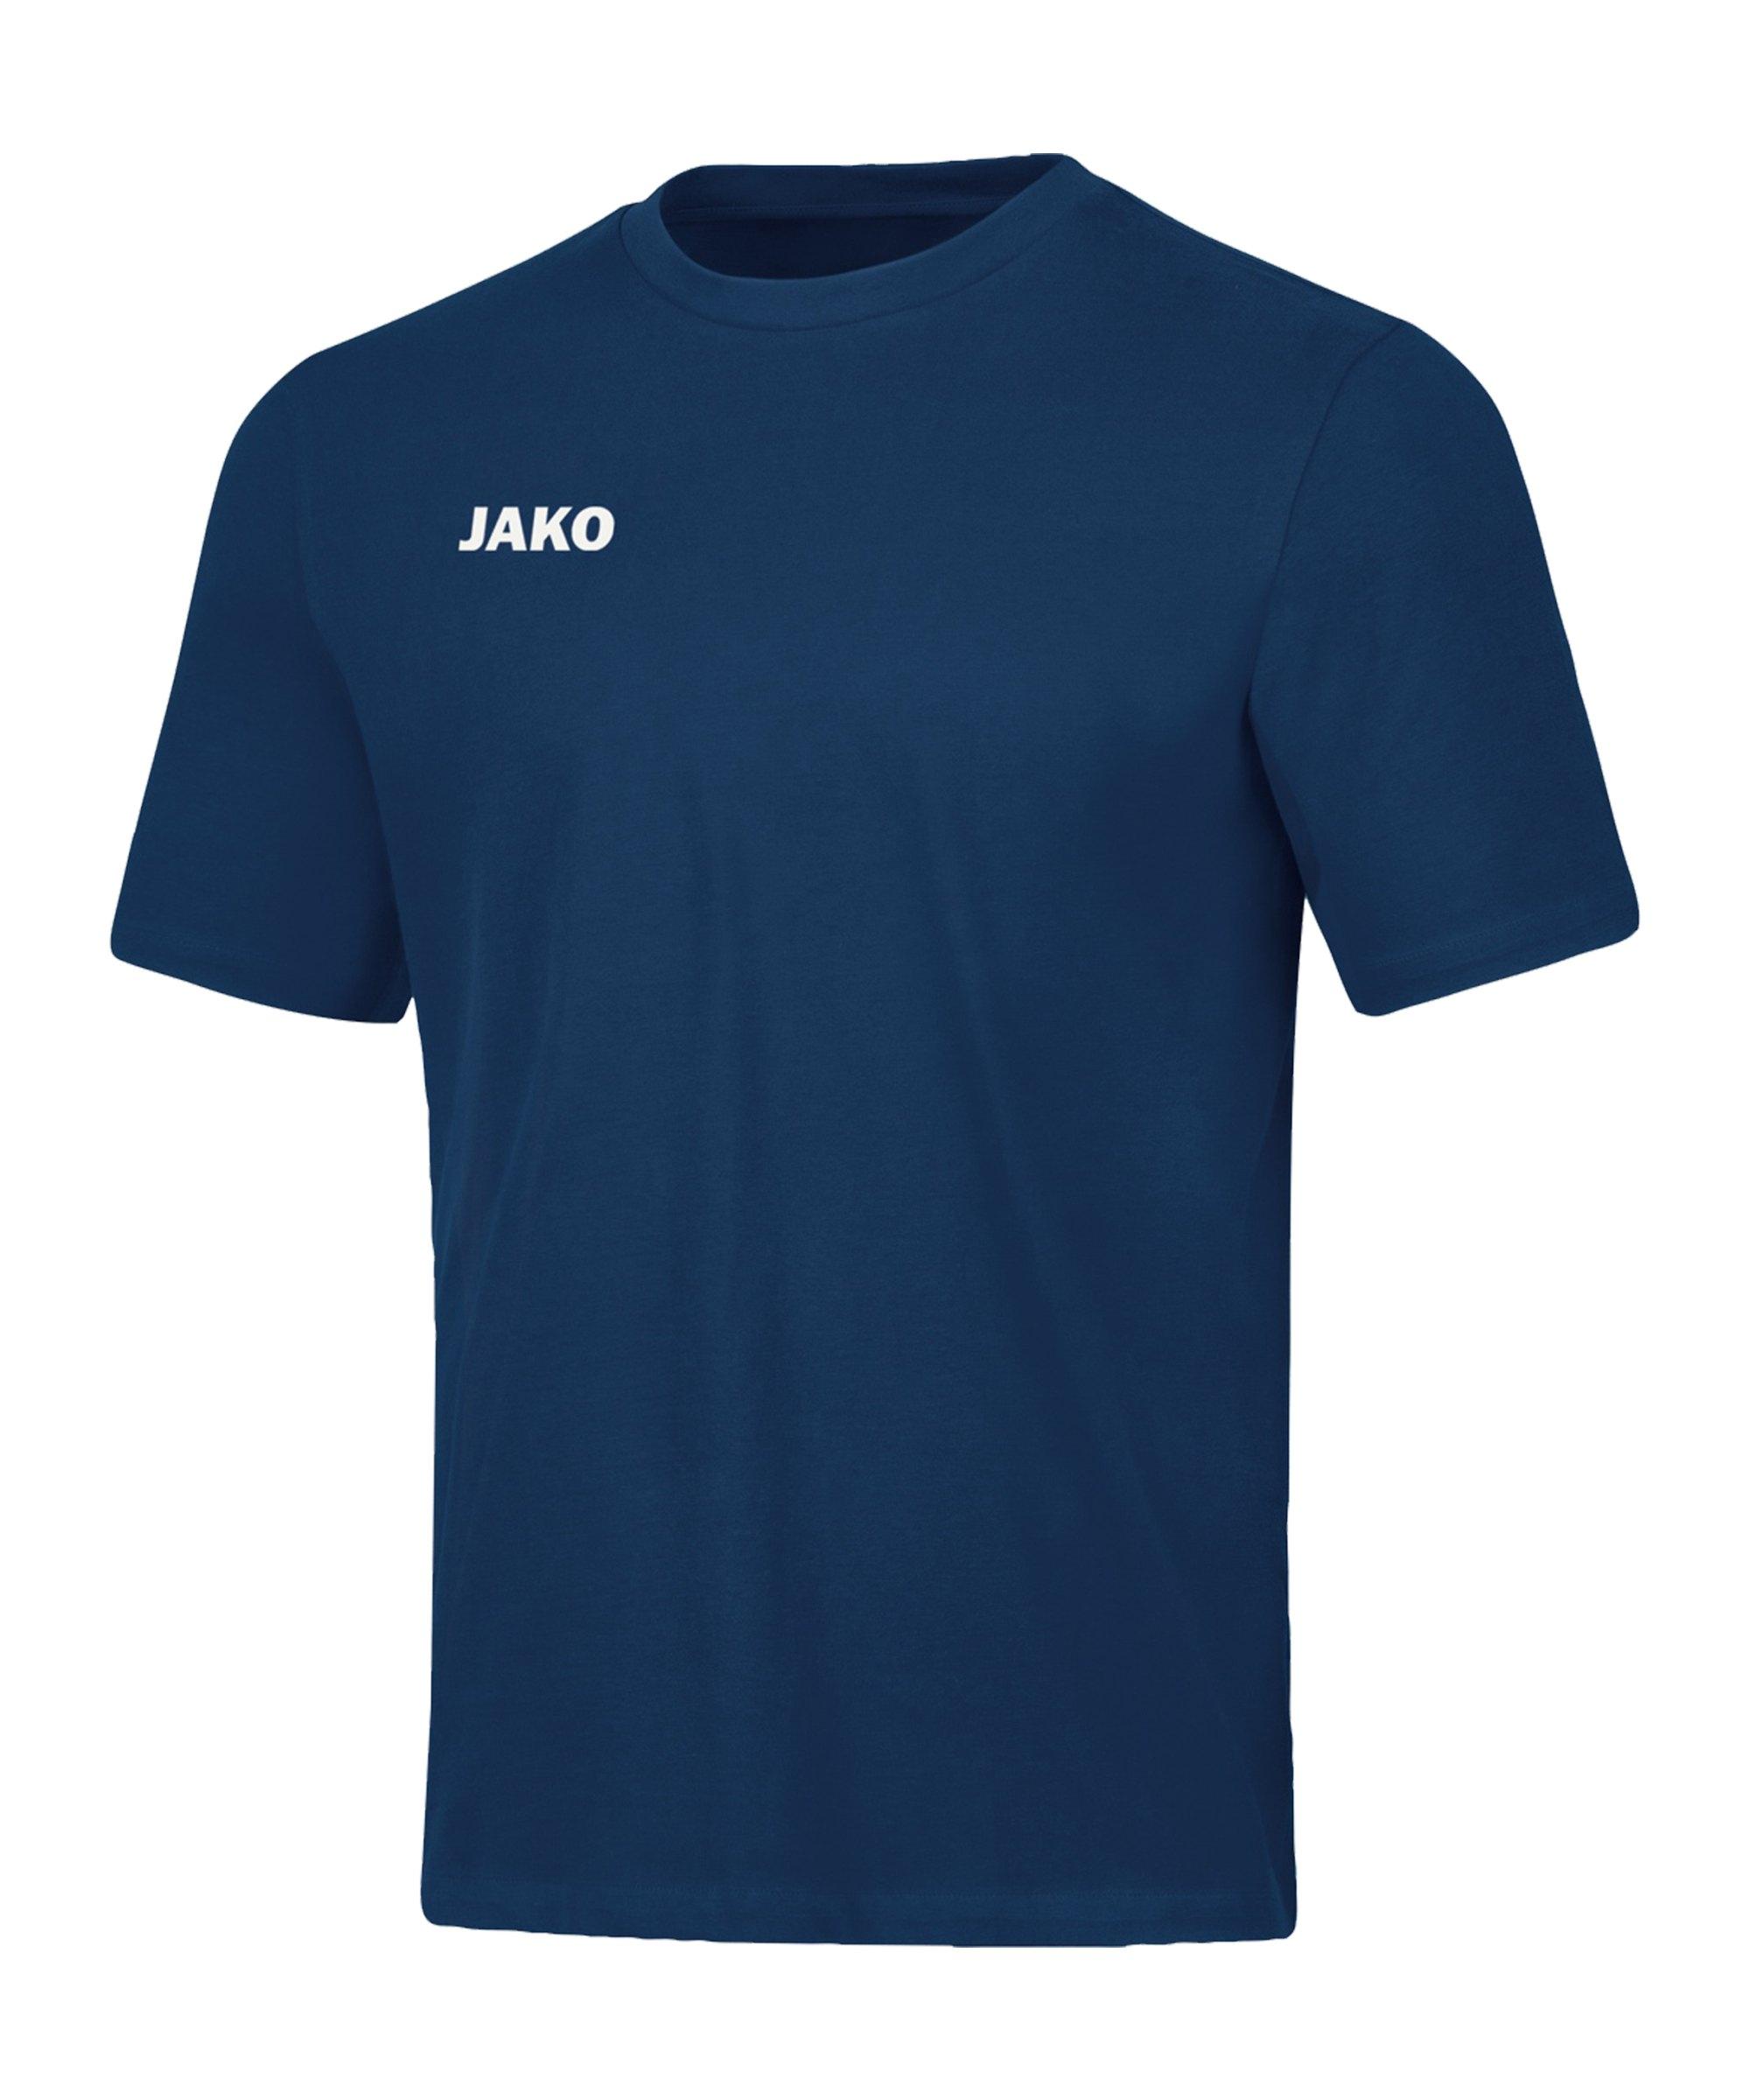 JAKO Base T-Shirt Damen Blau F09 - blau